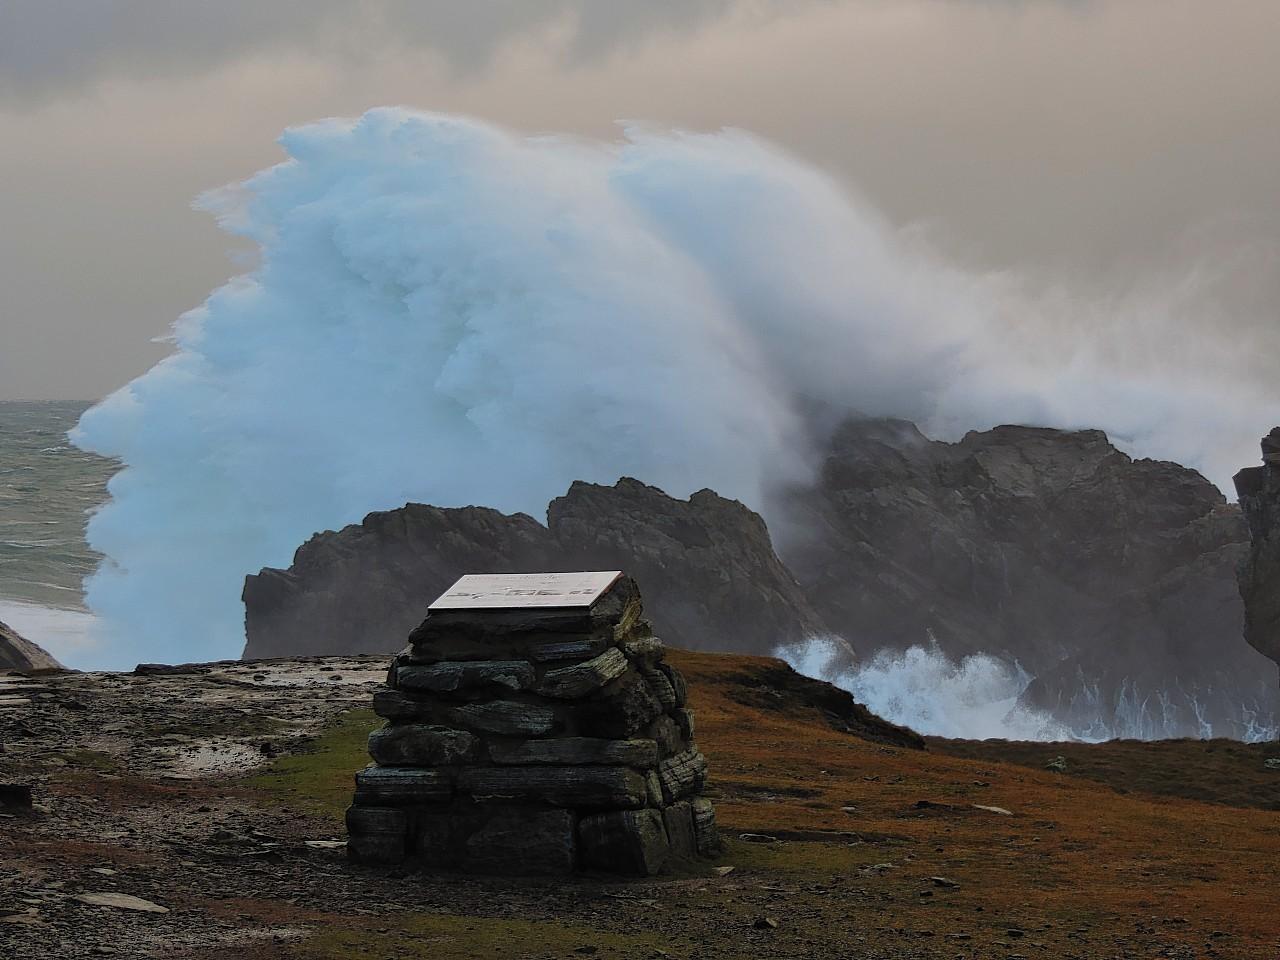 Hebridean waves picture by amateur photographer Ali Finlayson